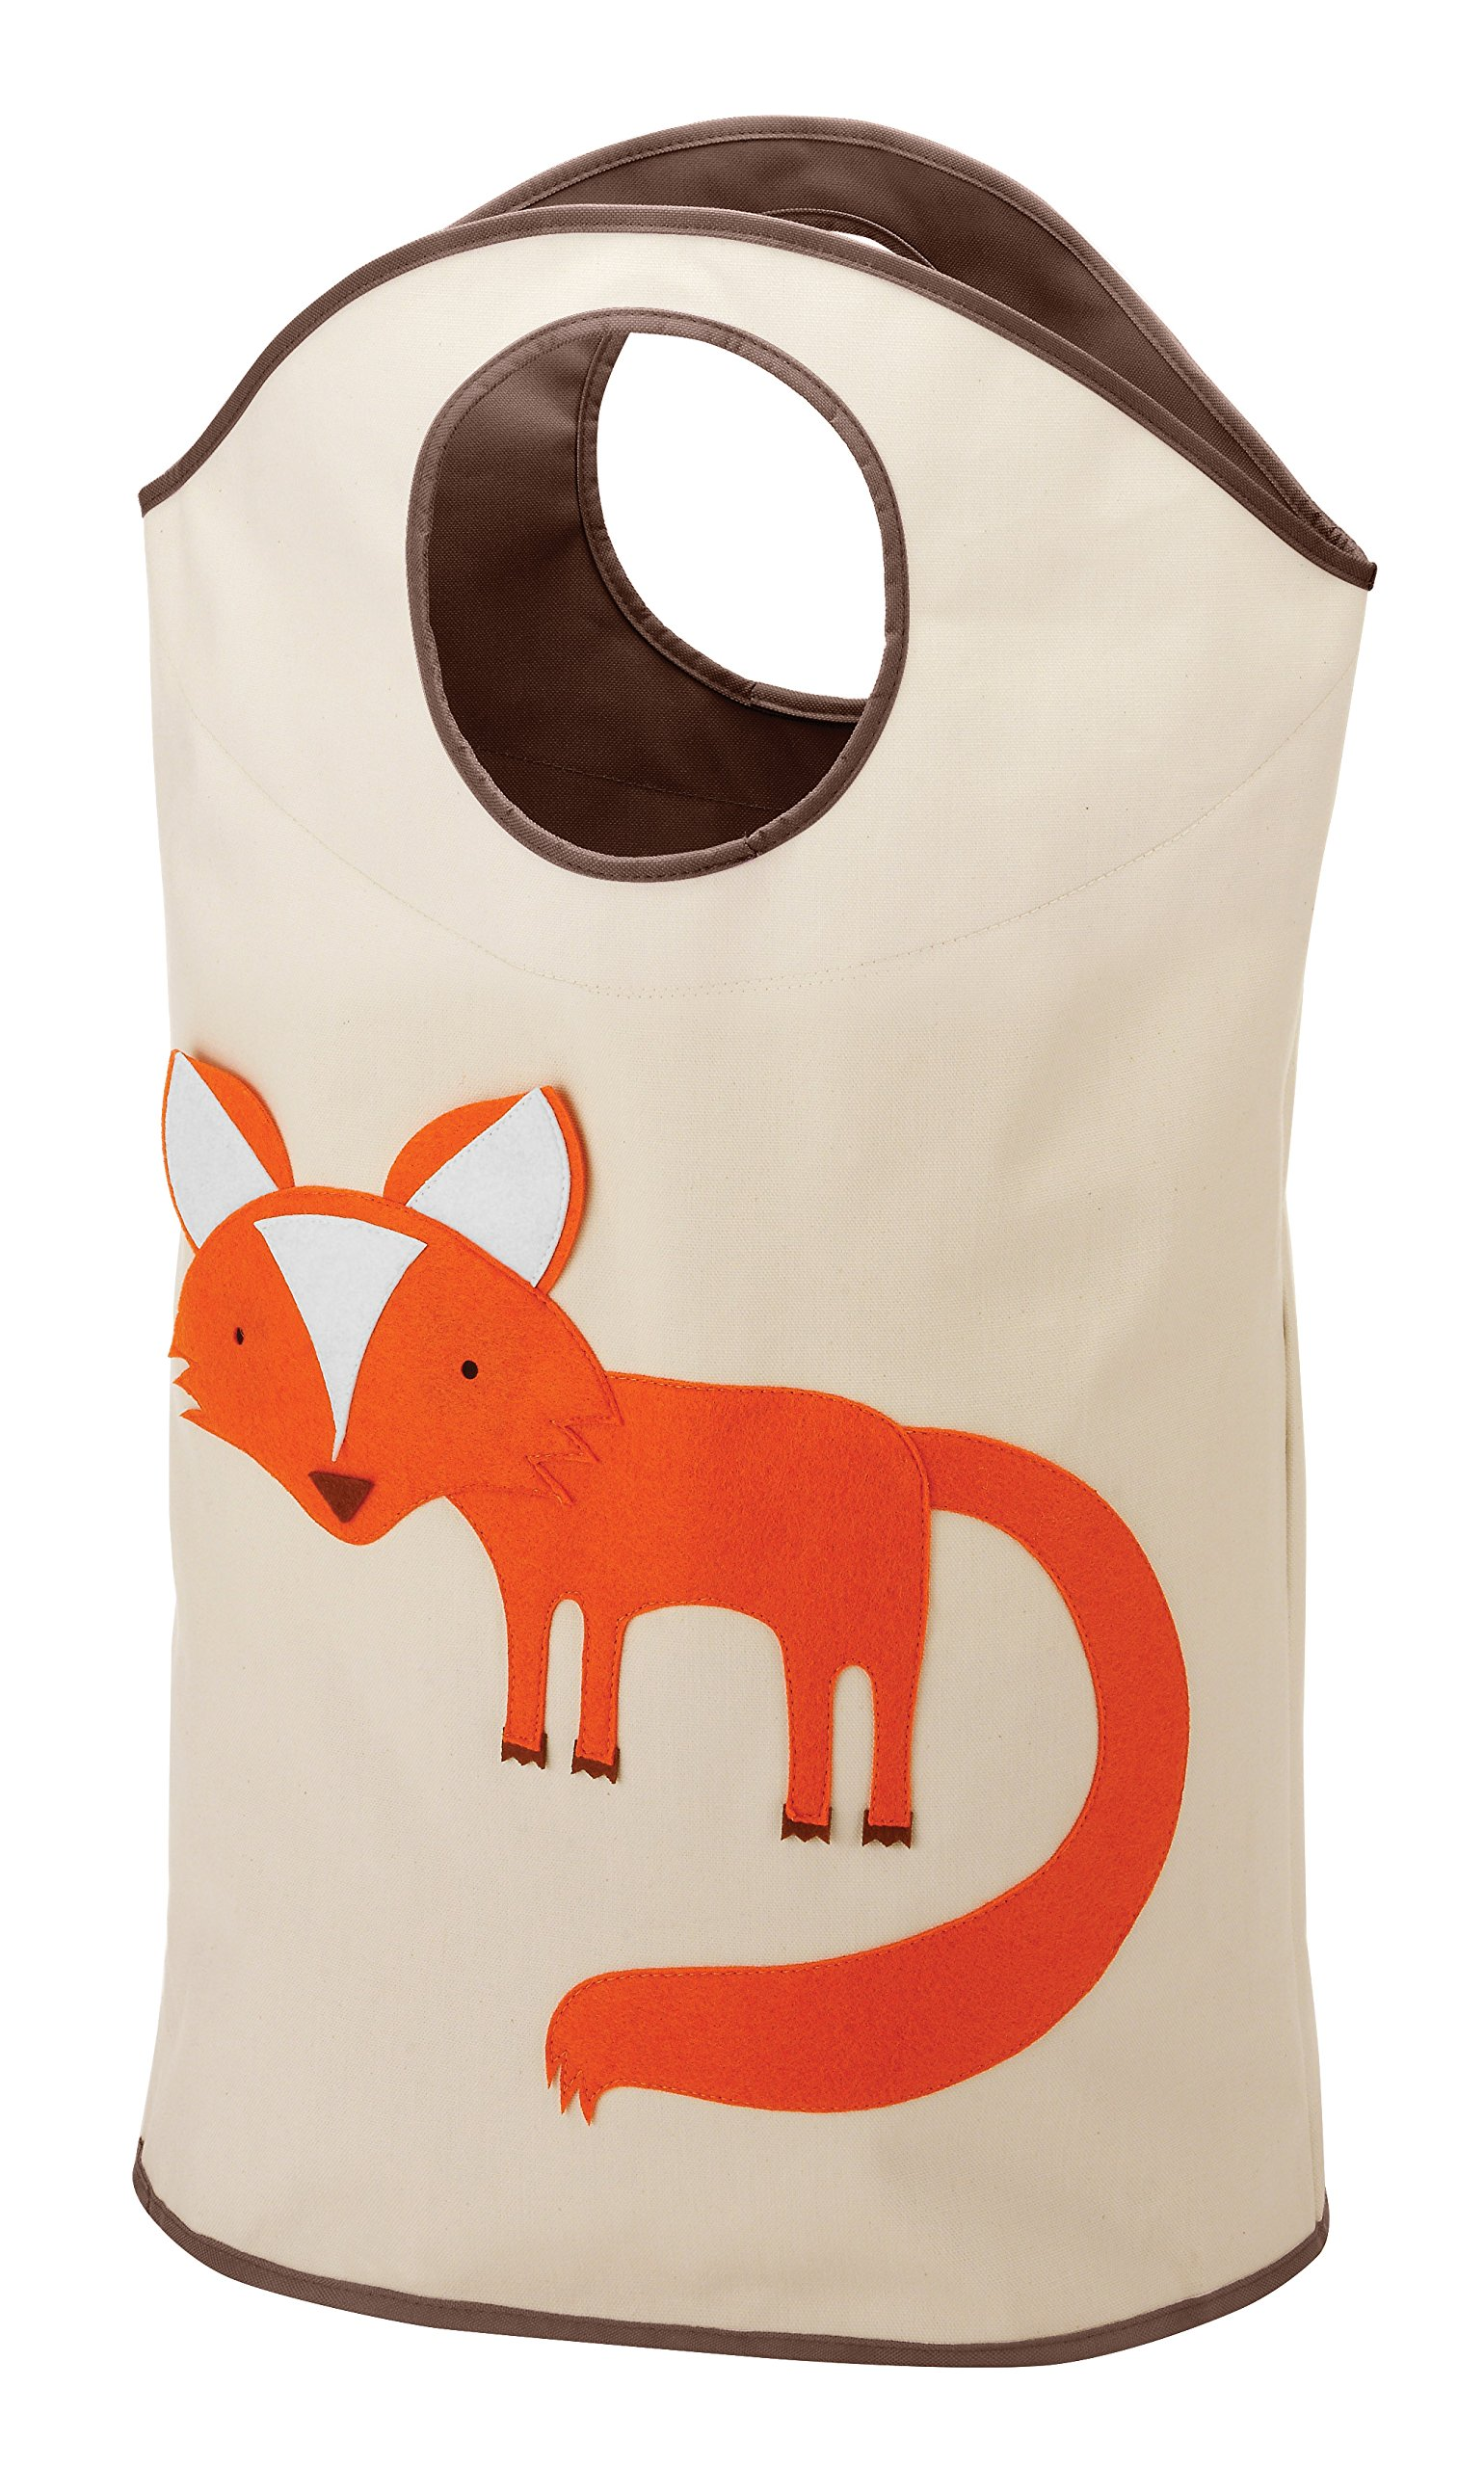 Whitmor Laundry Hamper Storage Tote Fox